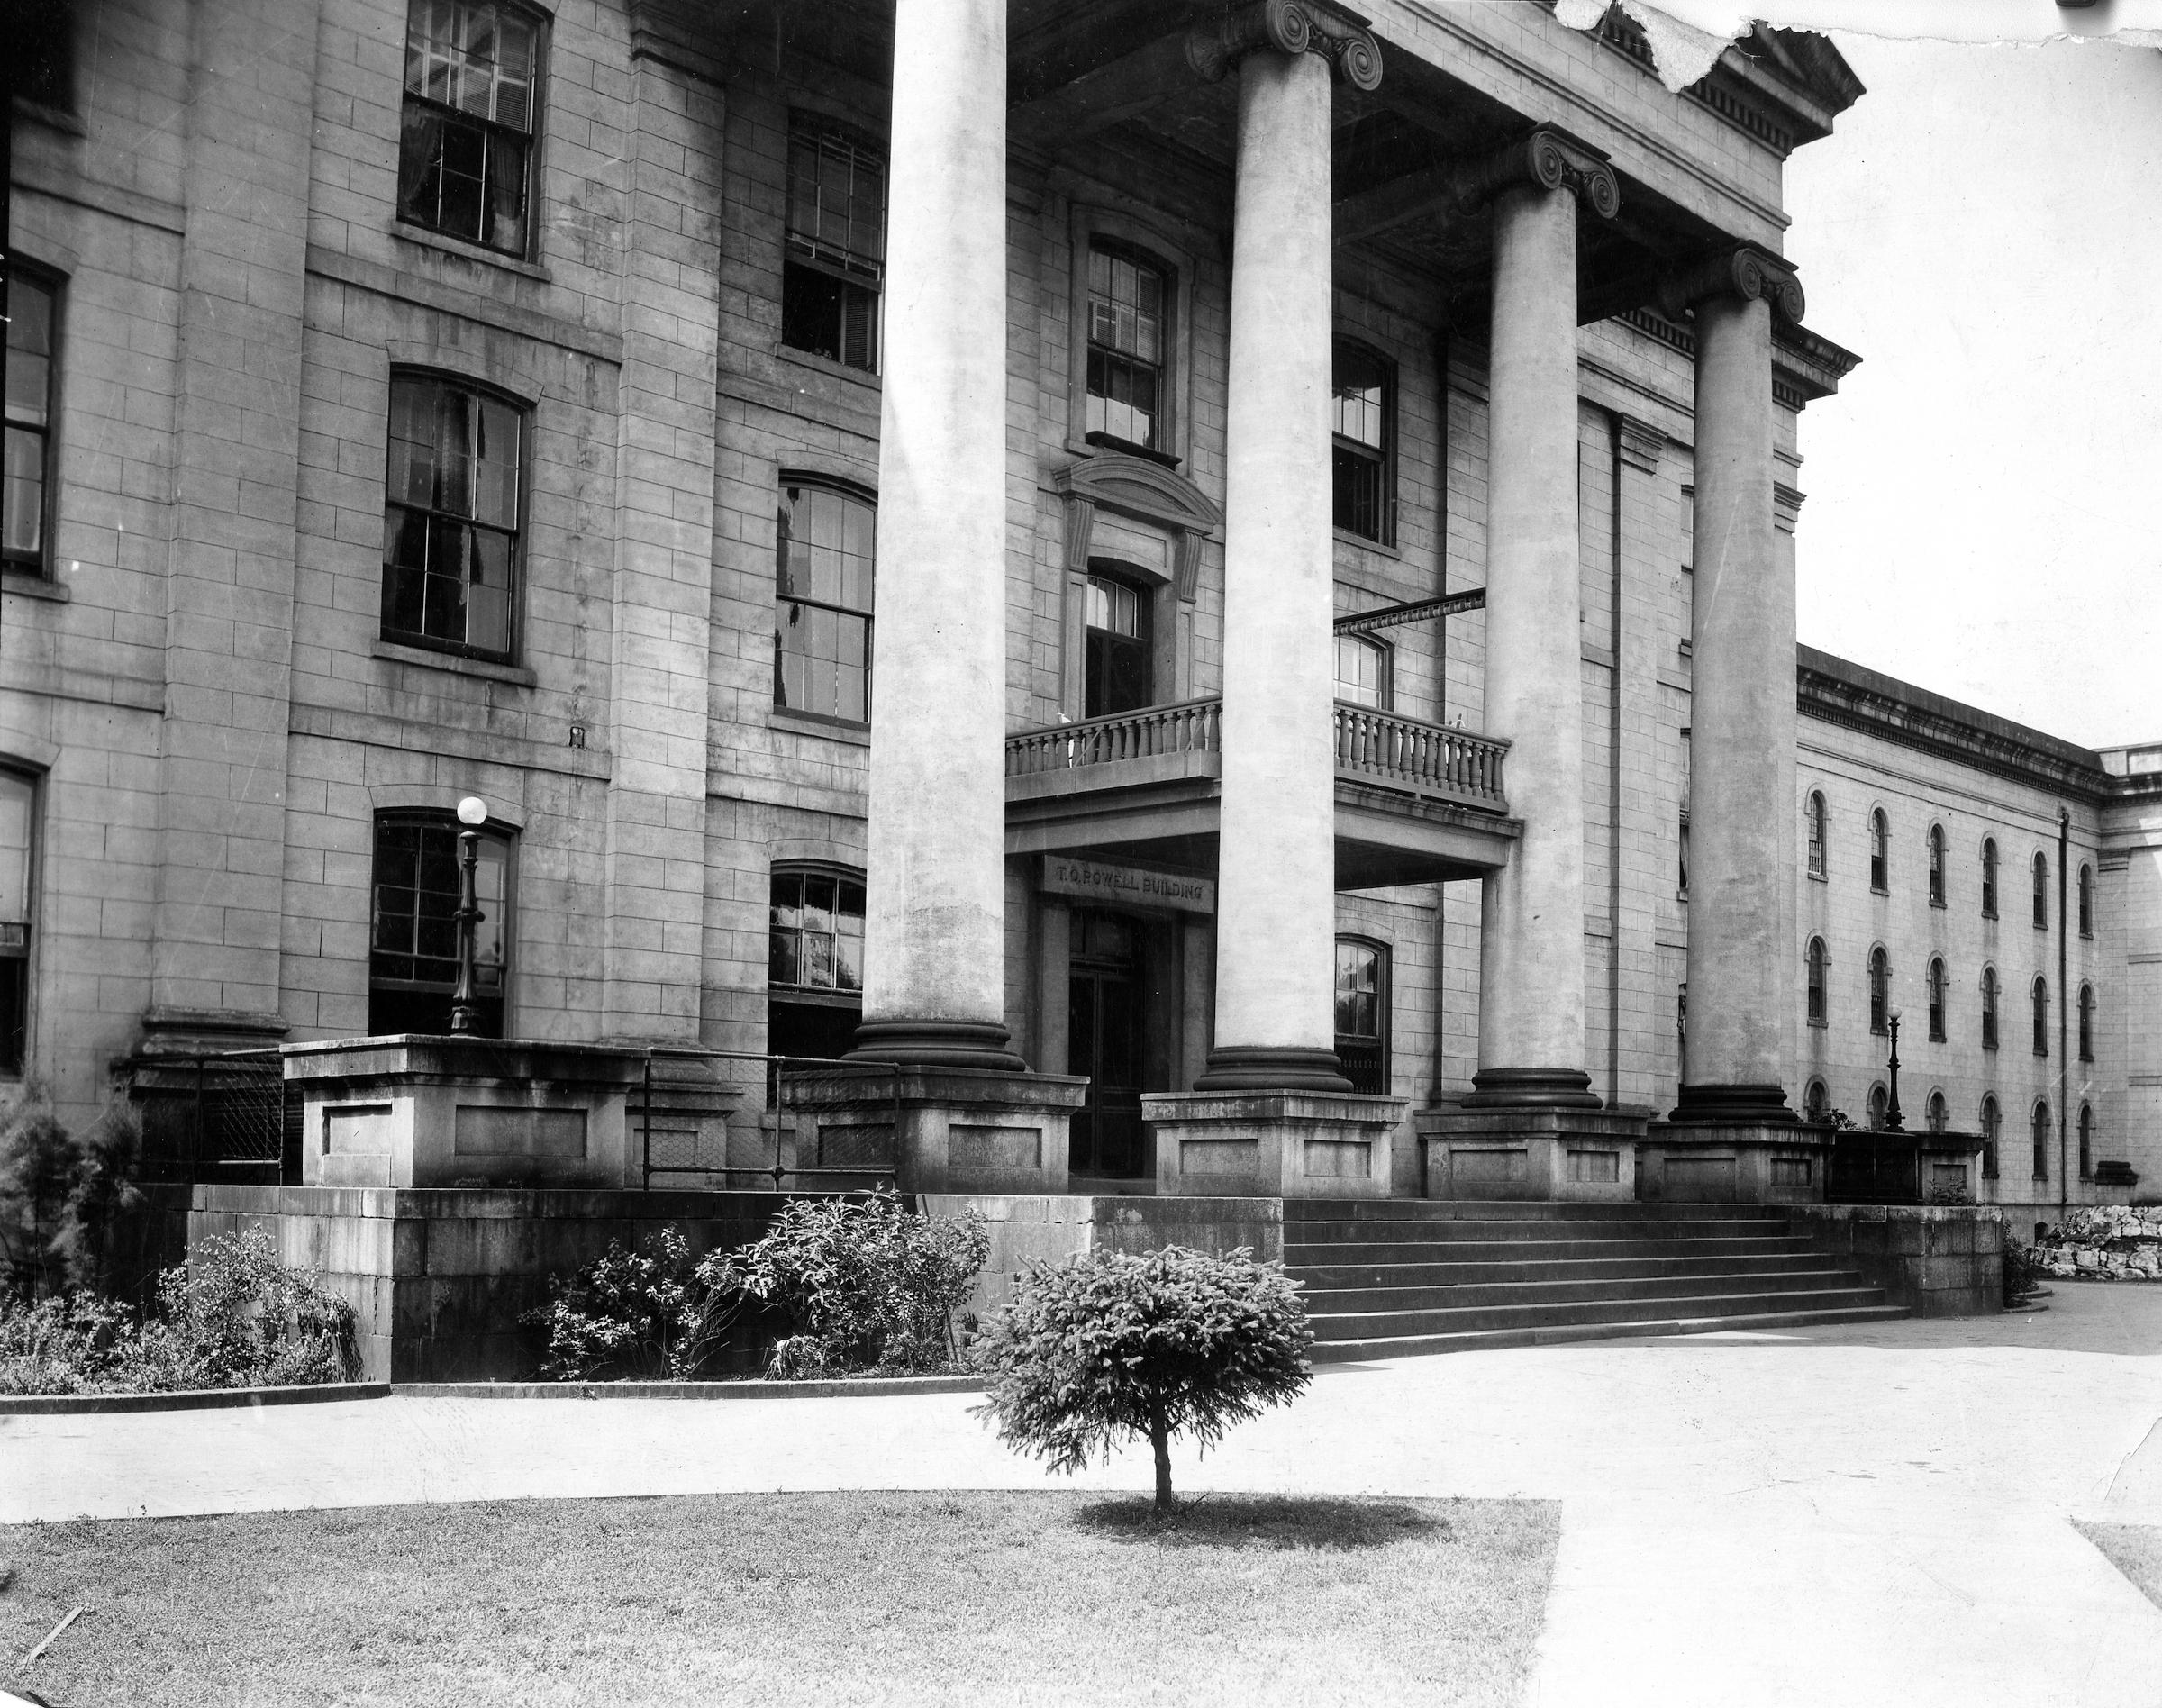 Administration building of Milledgeville State Hospital, Milledgeville, Ga.